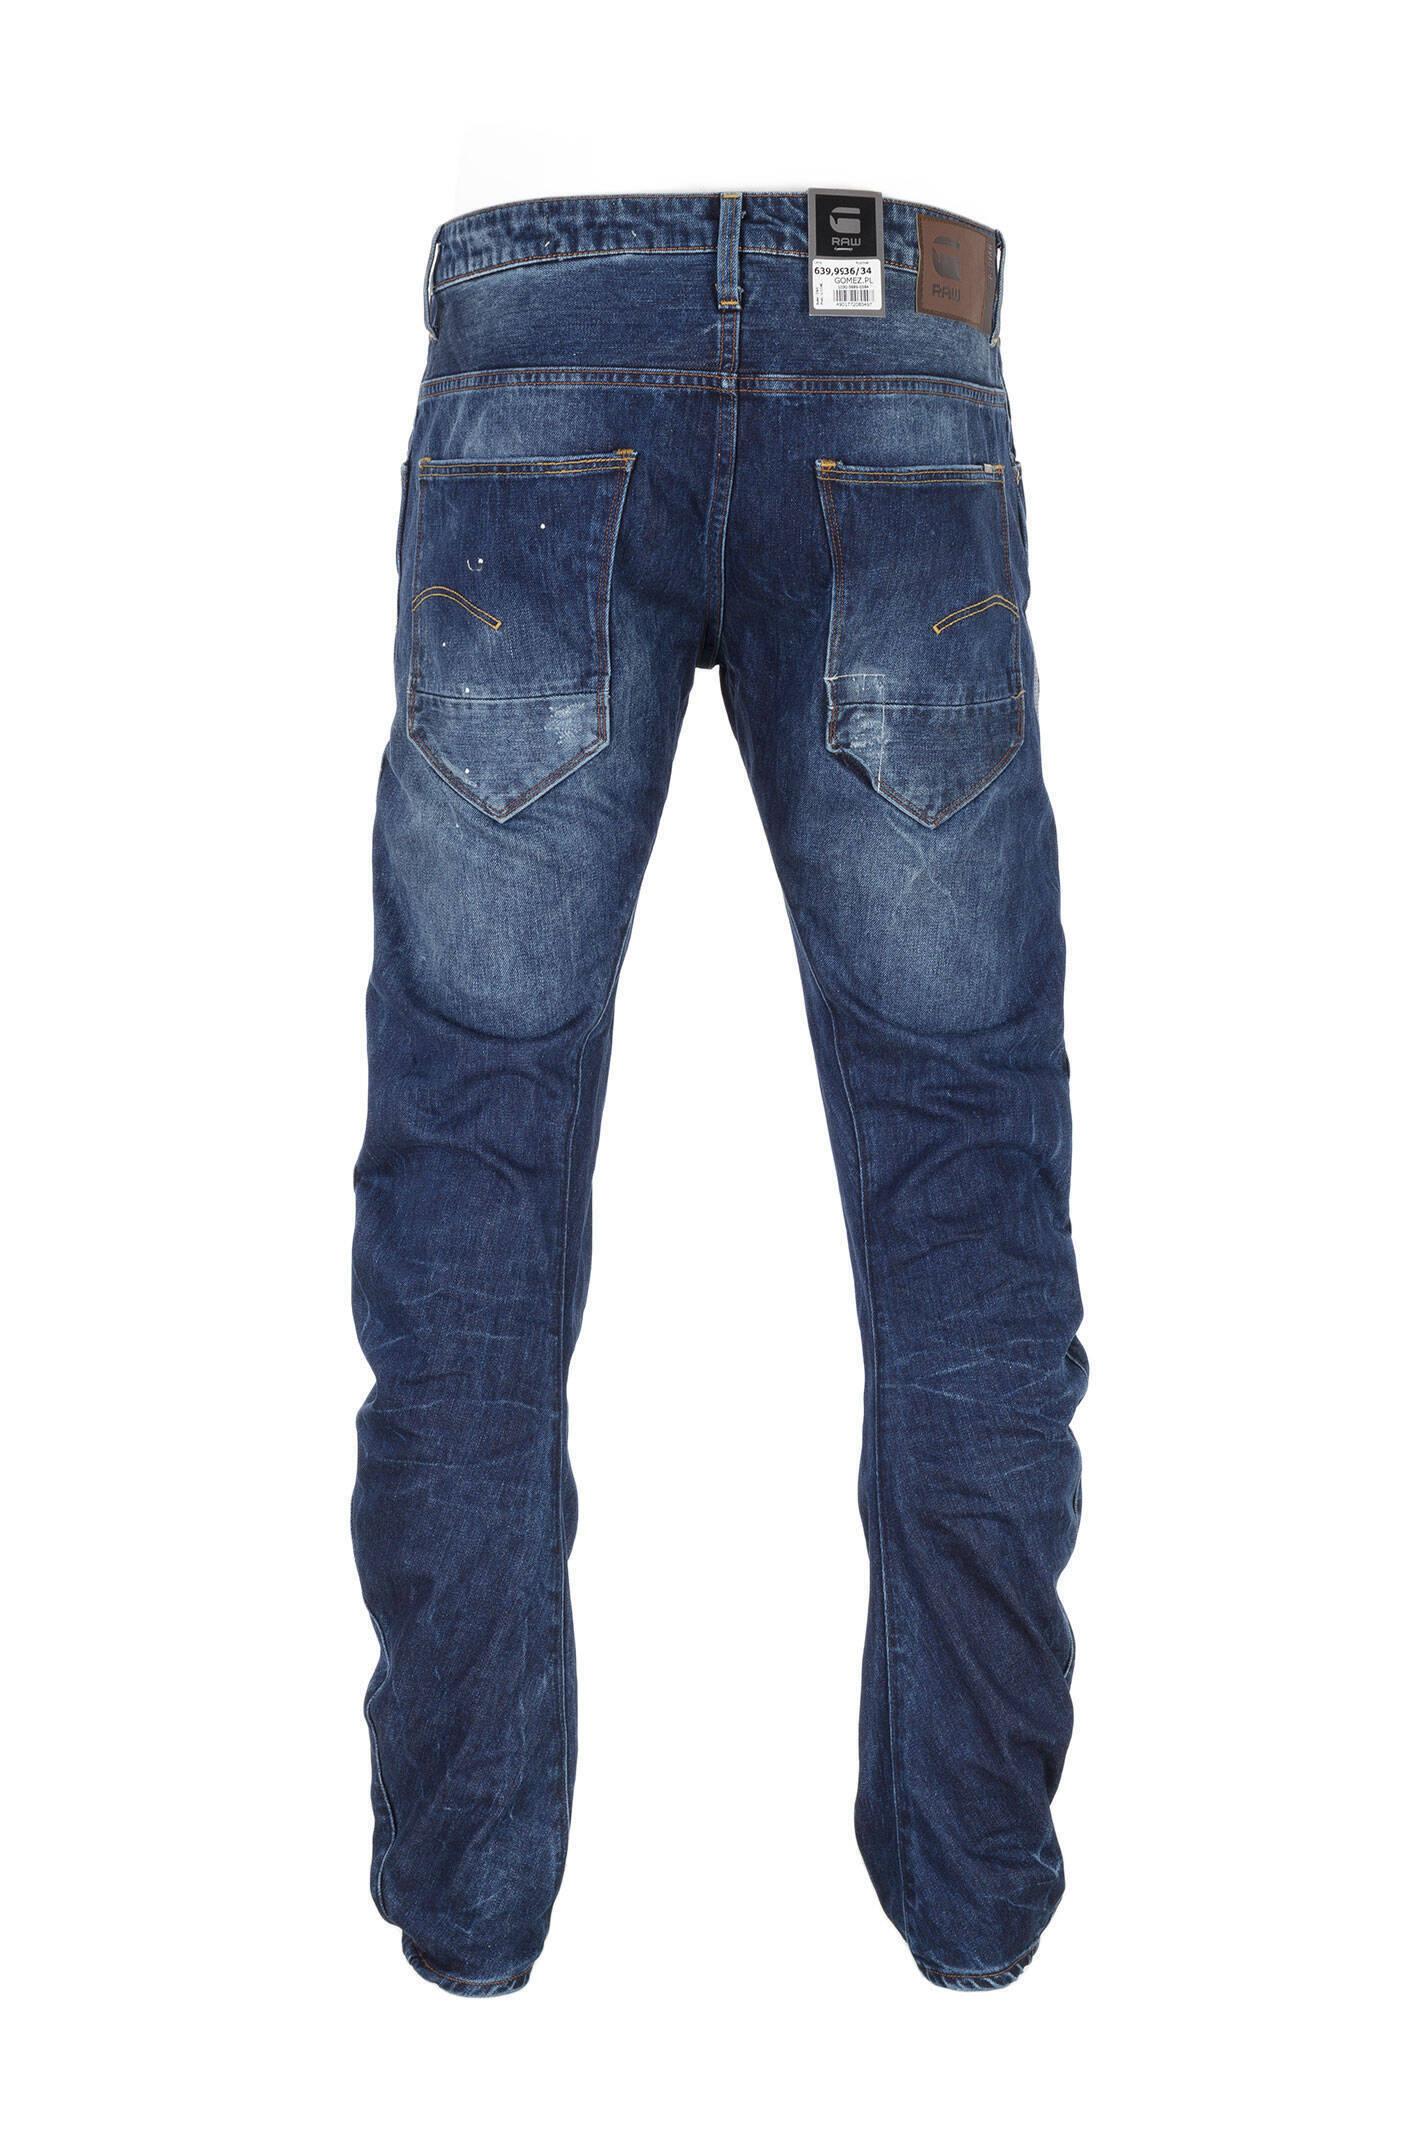 arc 3d slim jeans g star raw blue jeans pants. Black Bedroom Furniture Sets. Home Design Ideas